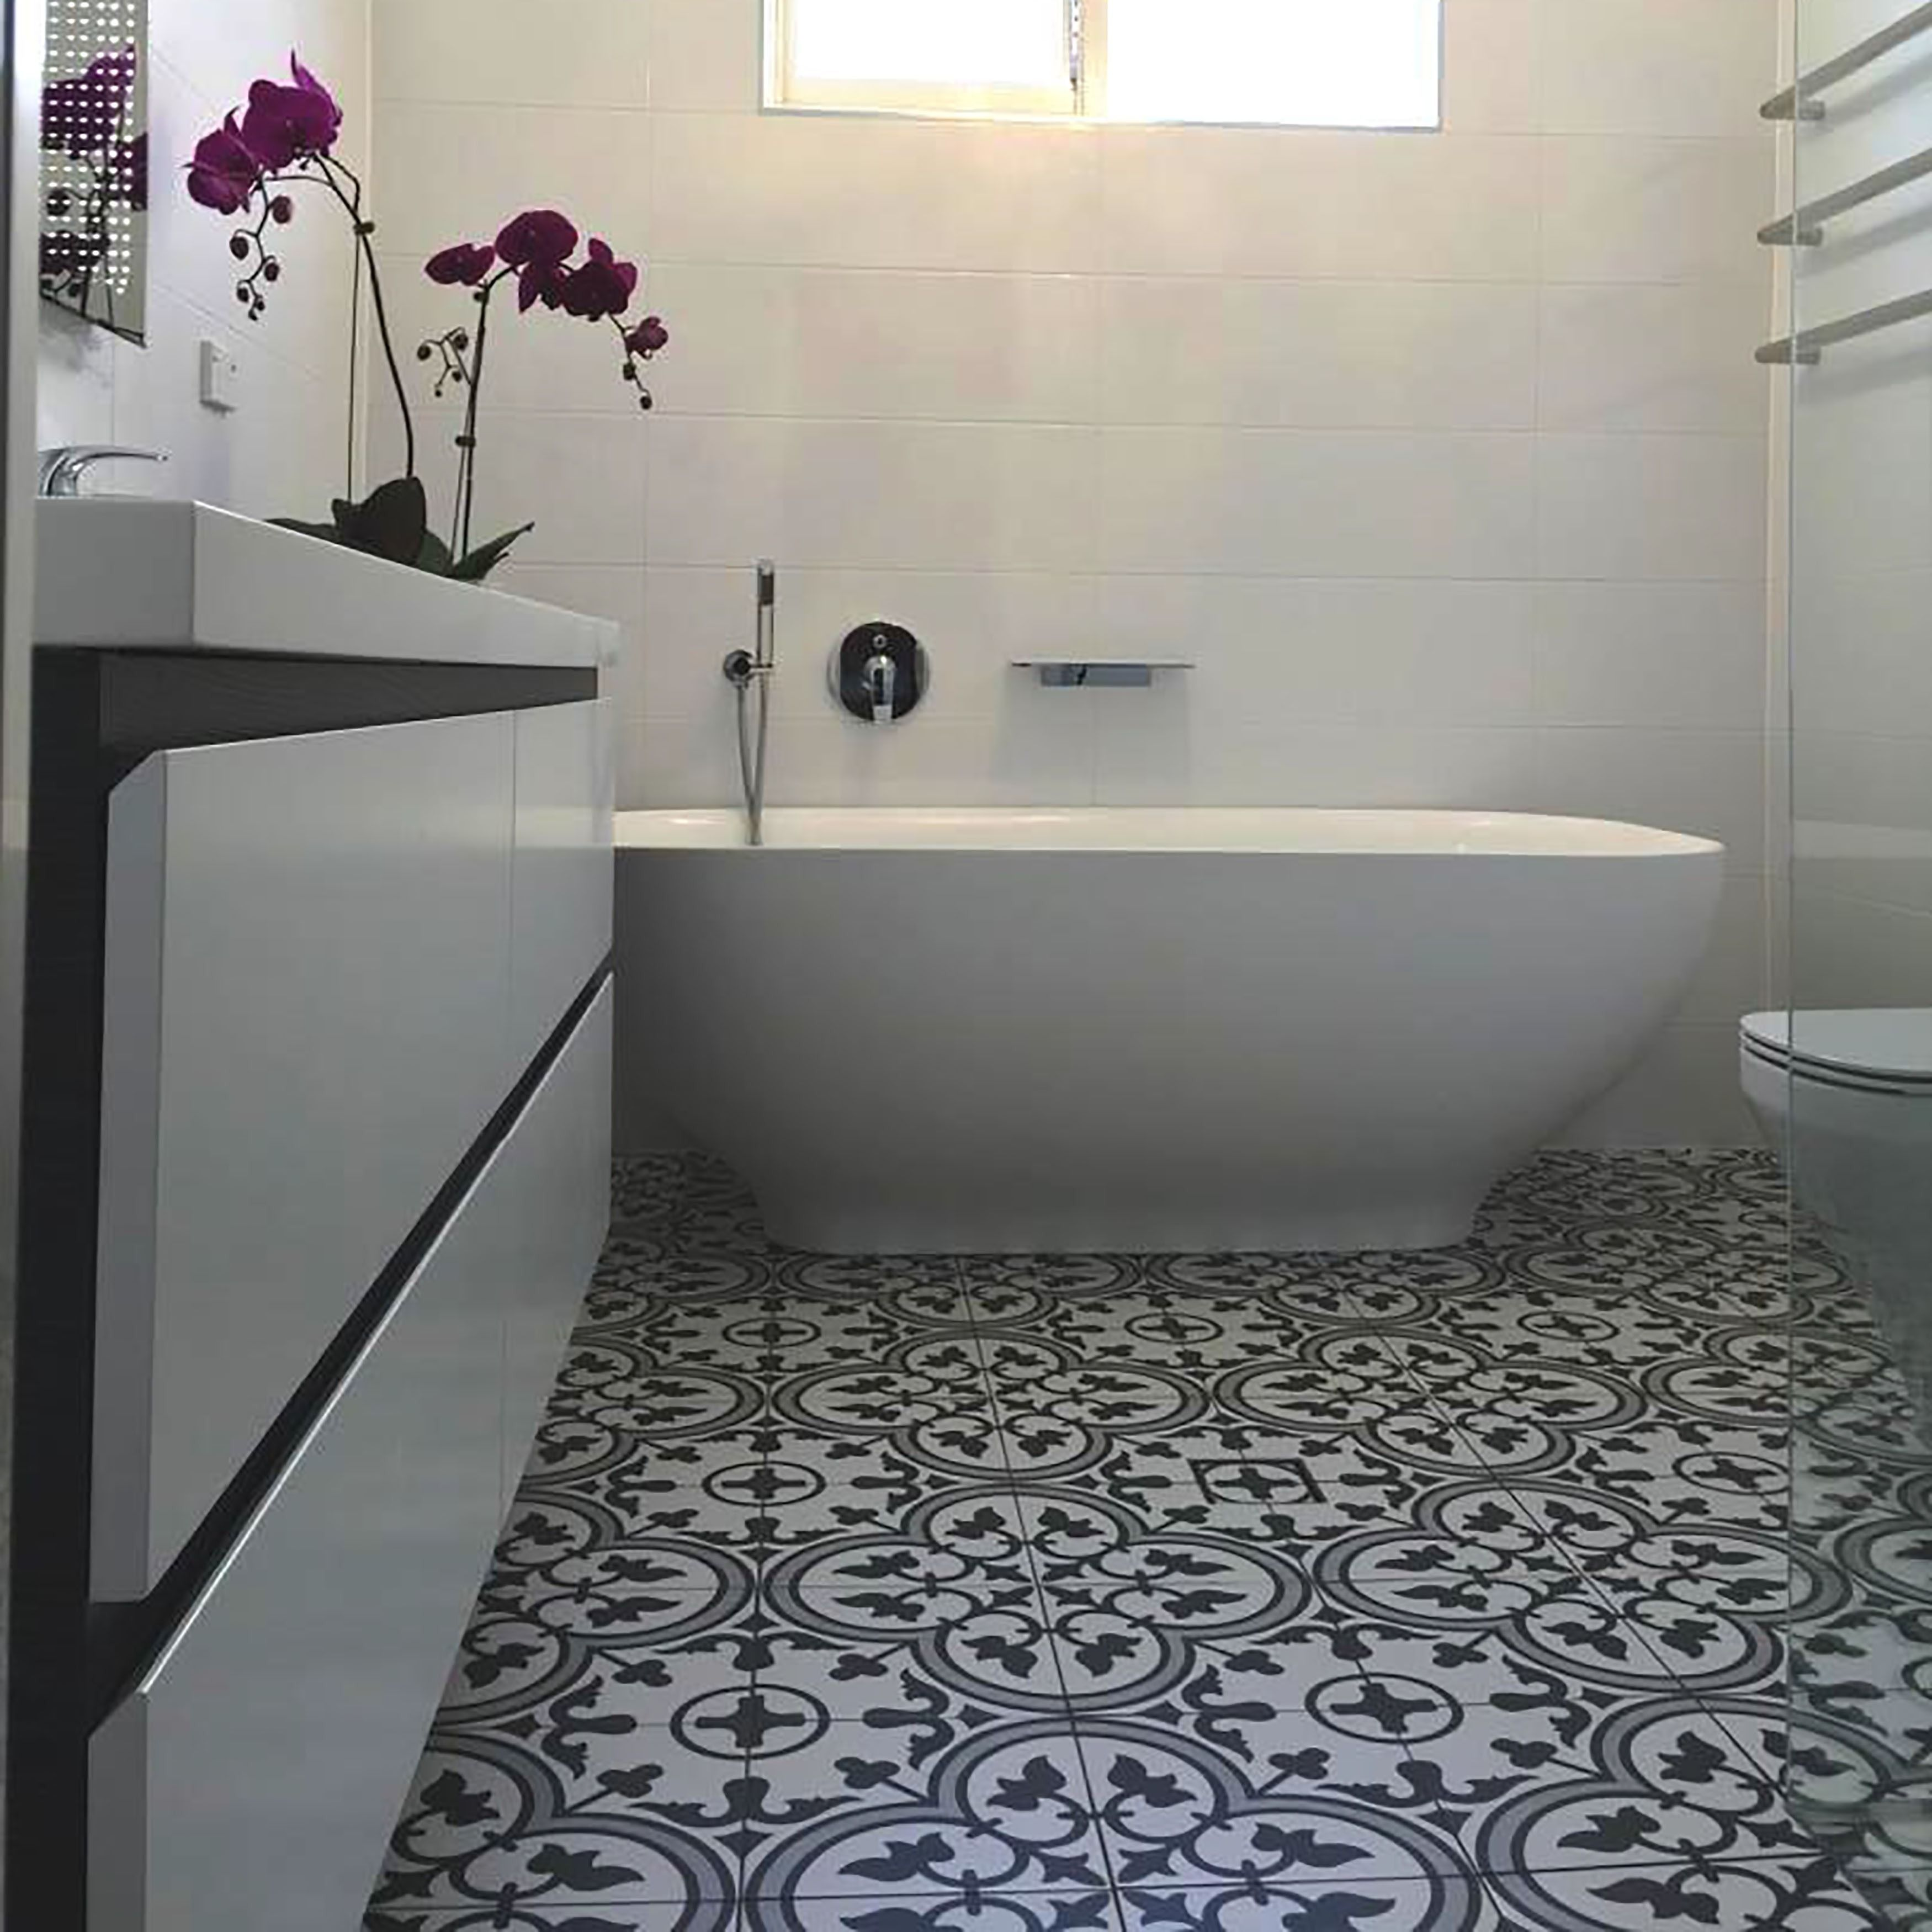 Somertile x art grey porcelain floor and for 10 inch floor tiles